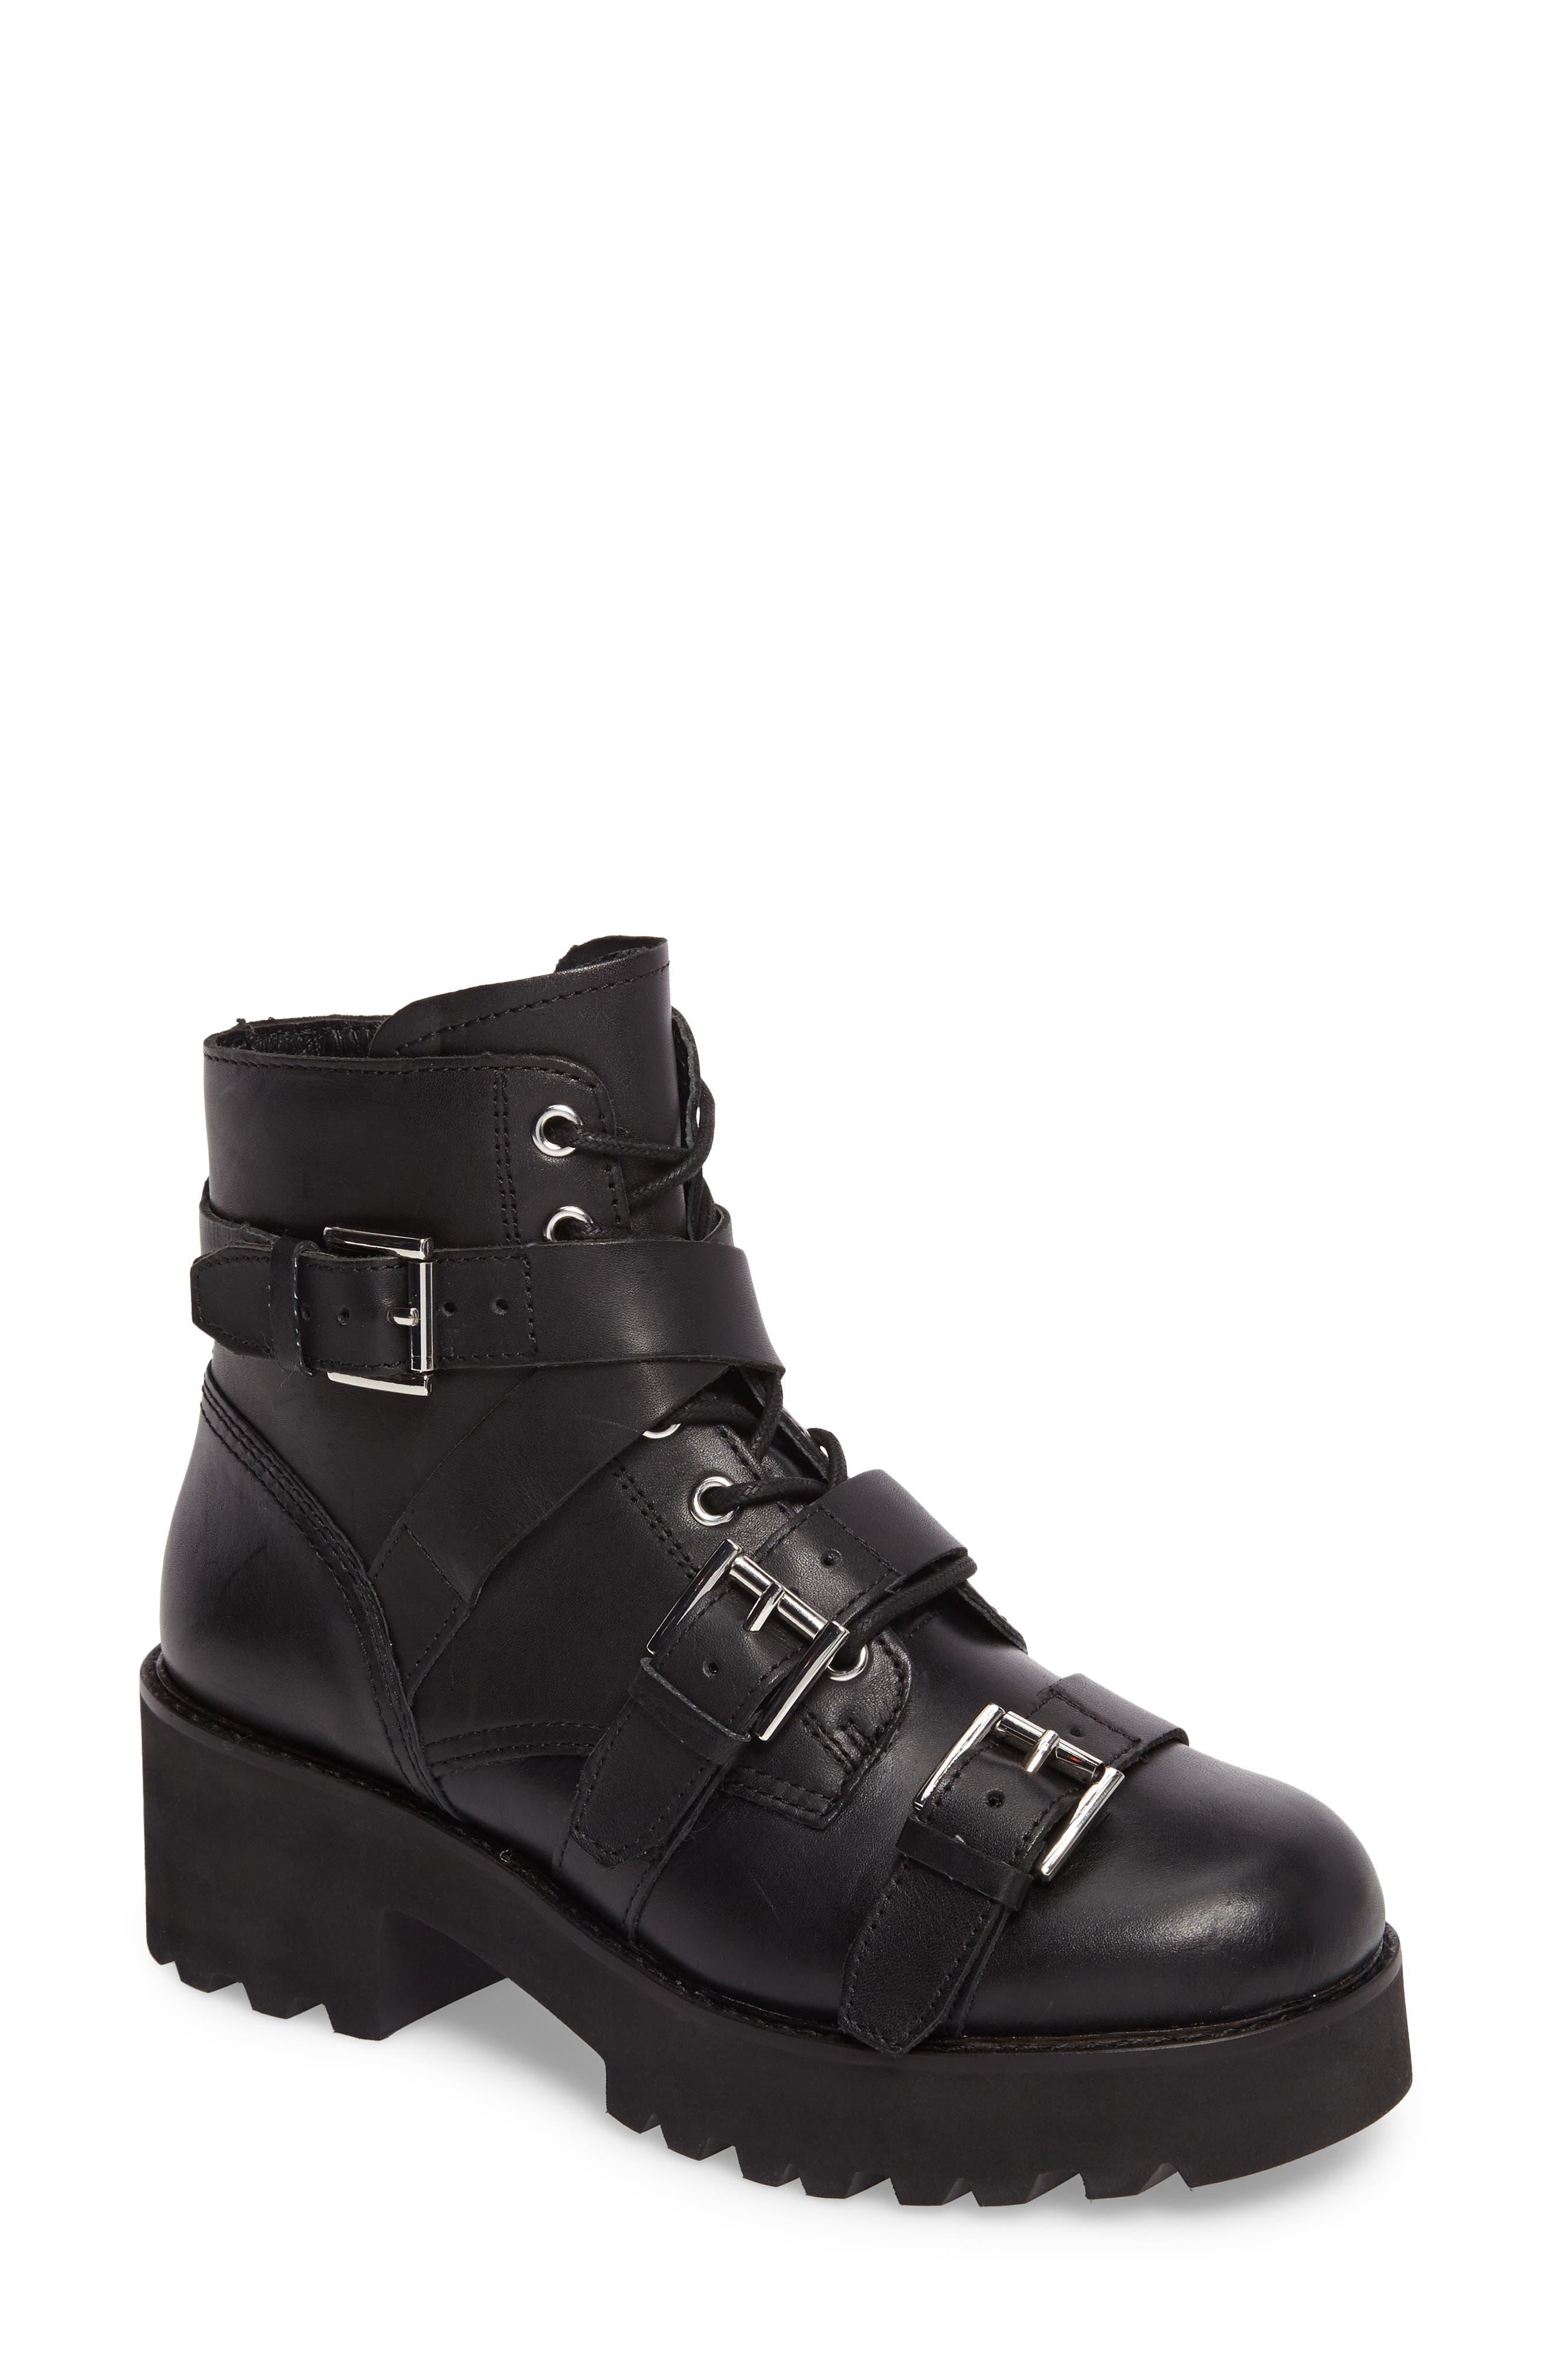 Razor Bootie,                             Main thumbnail 1, color,                             Black Leather